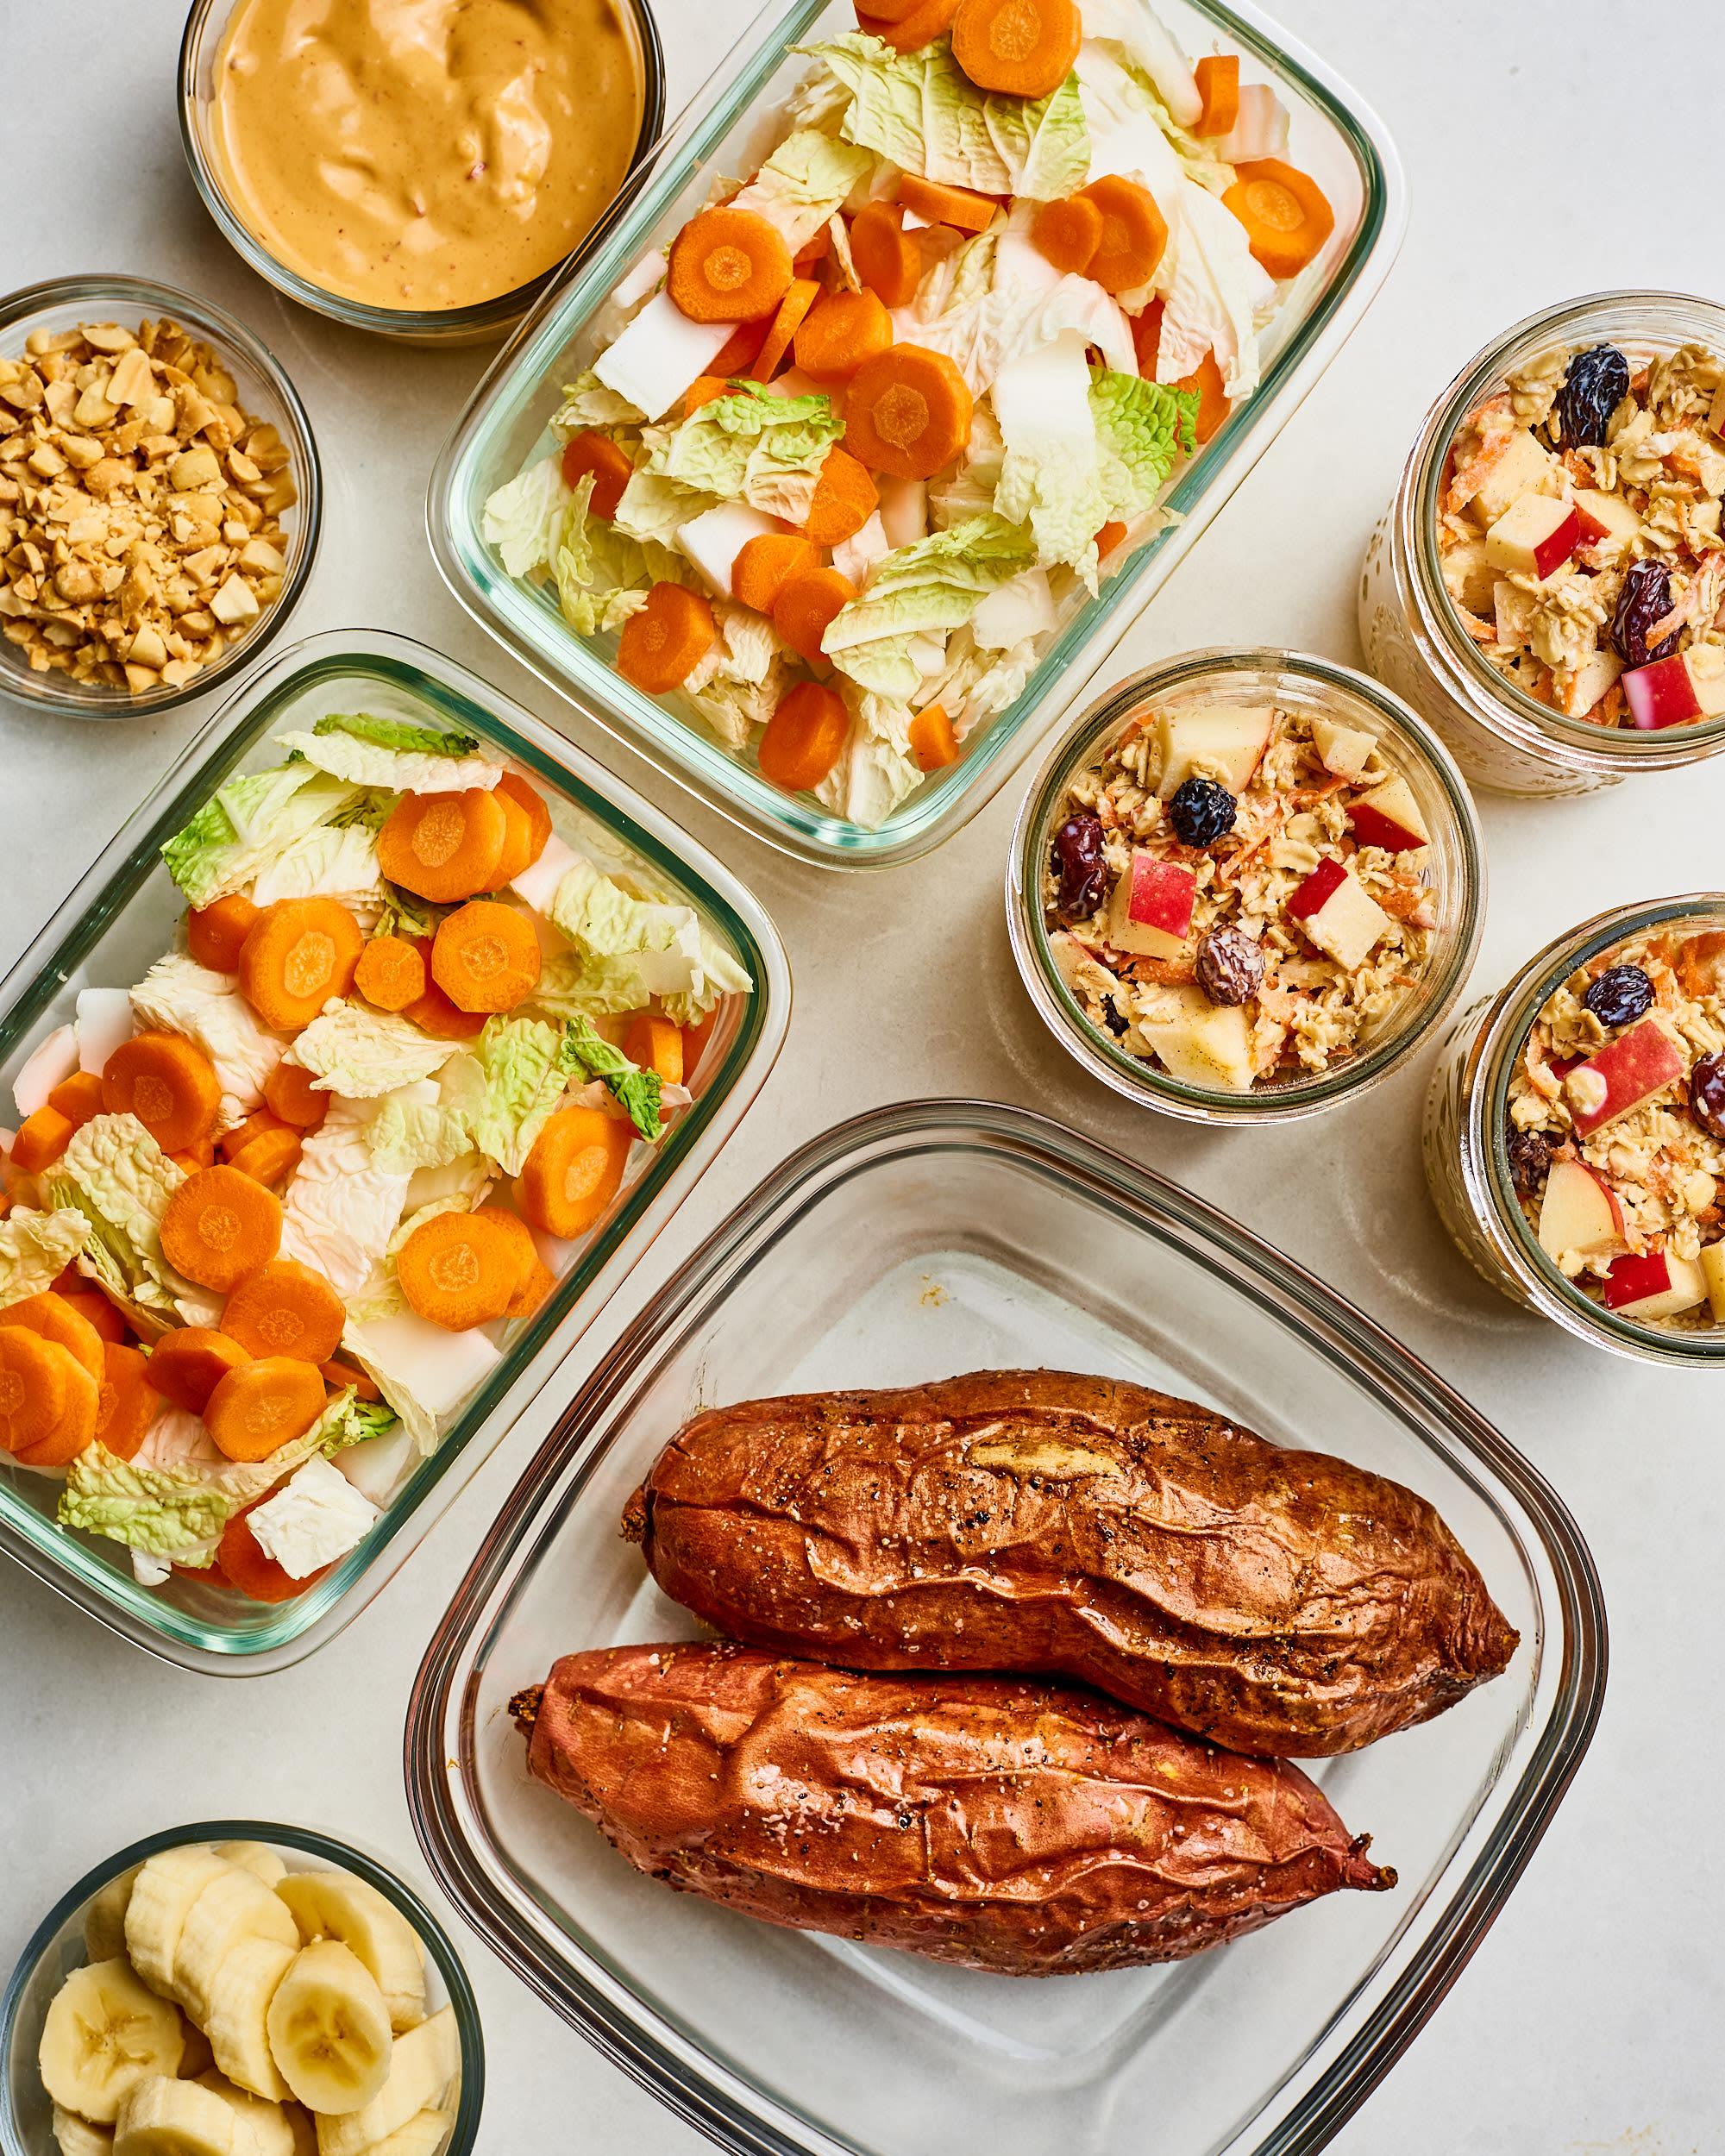 Meal Prep Plan: How I Prep a Week of Vegan Meals